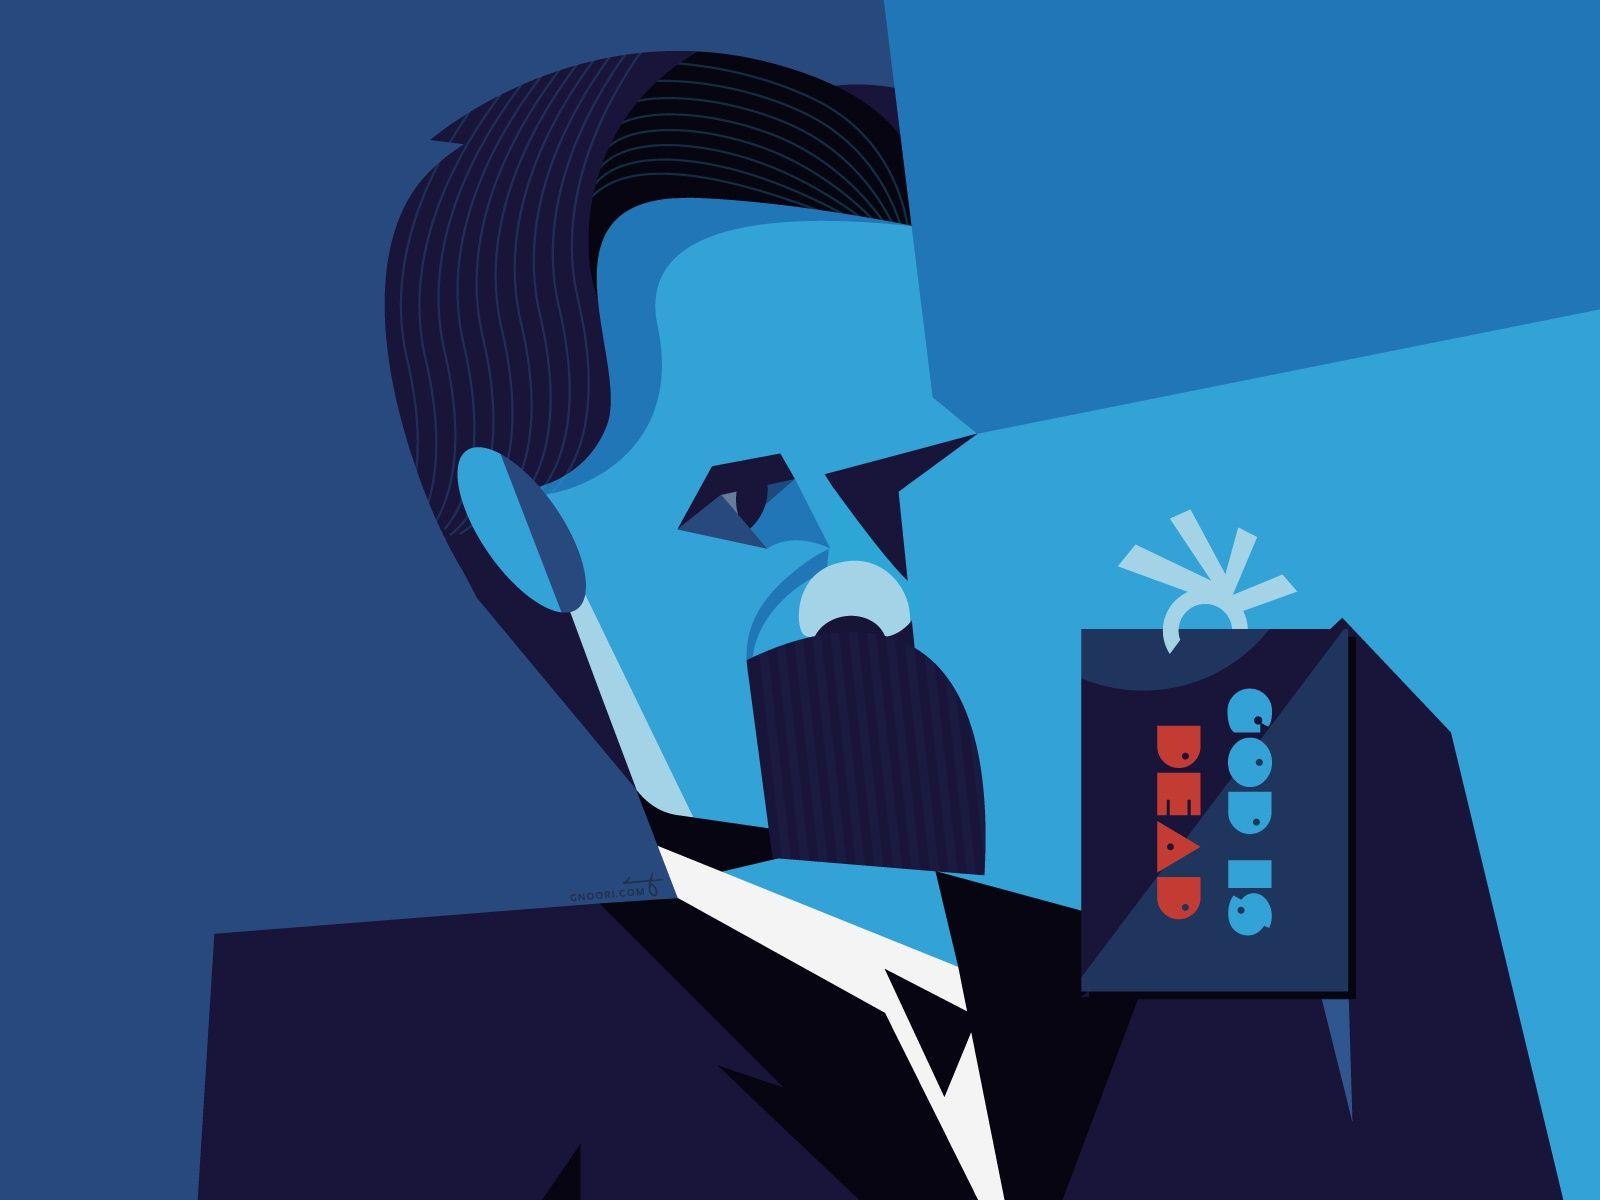 Friedrich Nietzsche Friedrich Nietzsche Geometric Portrait Nietzsche